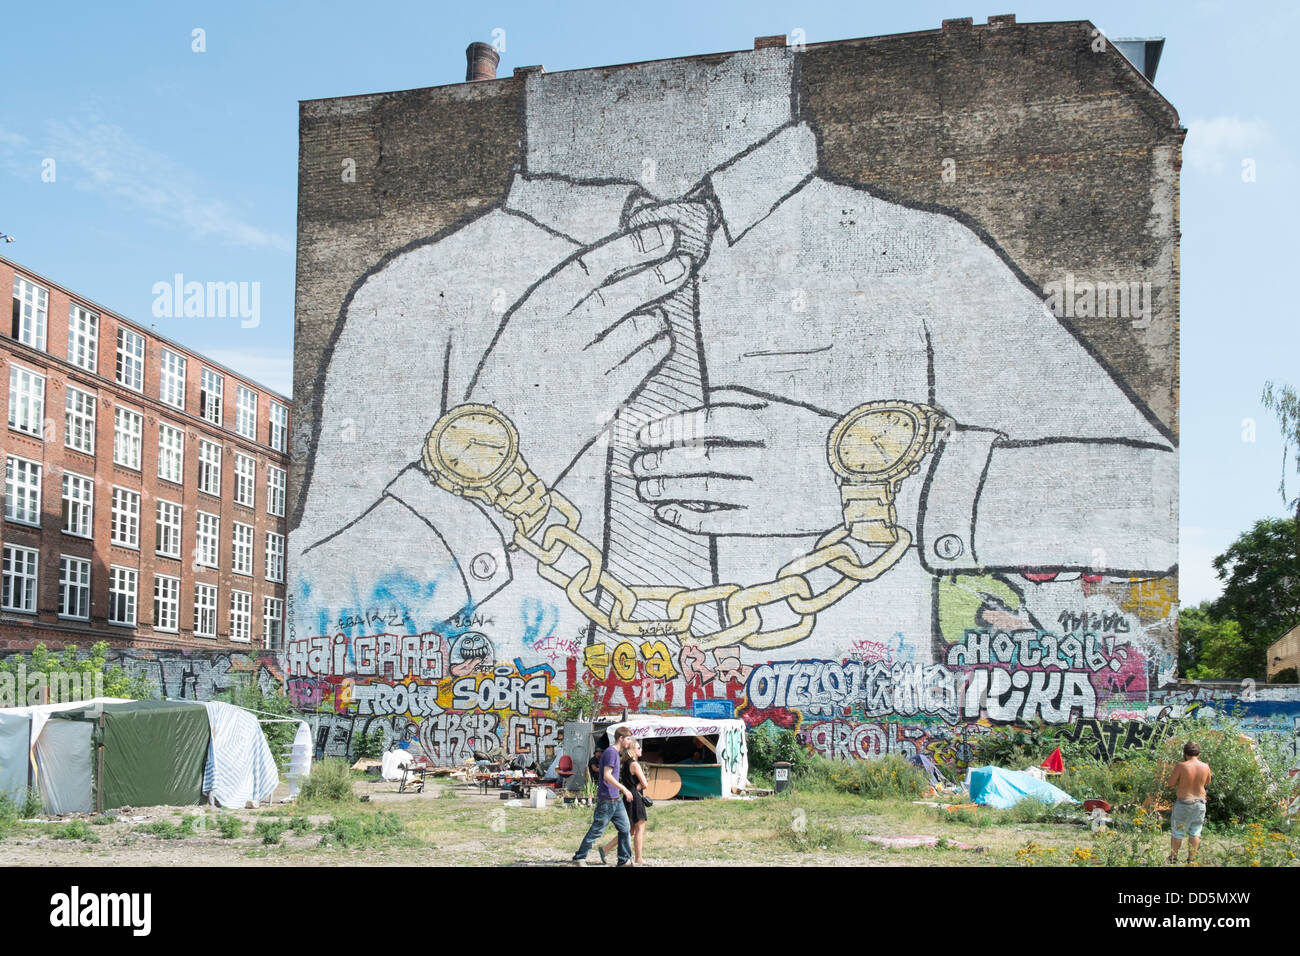 Street art in bohemian district of Kreuzberg in Berlin Germany - Stock Image